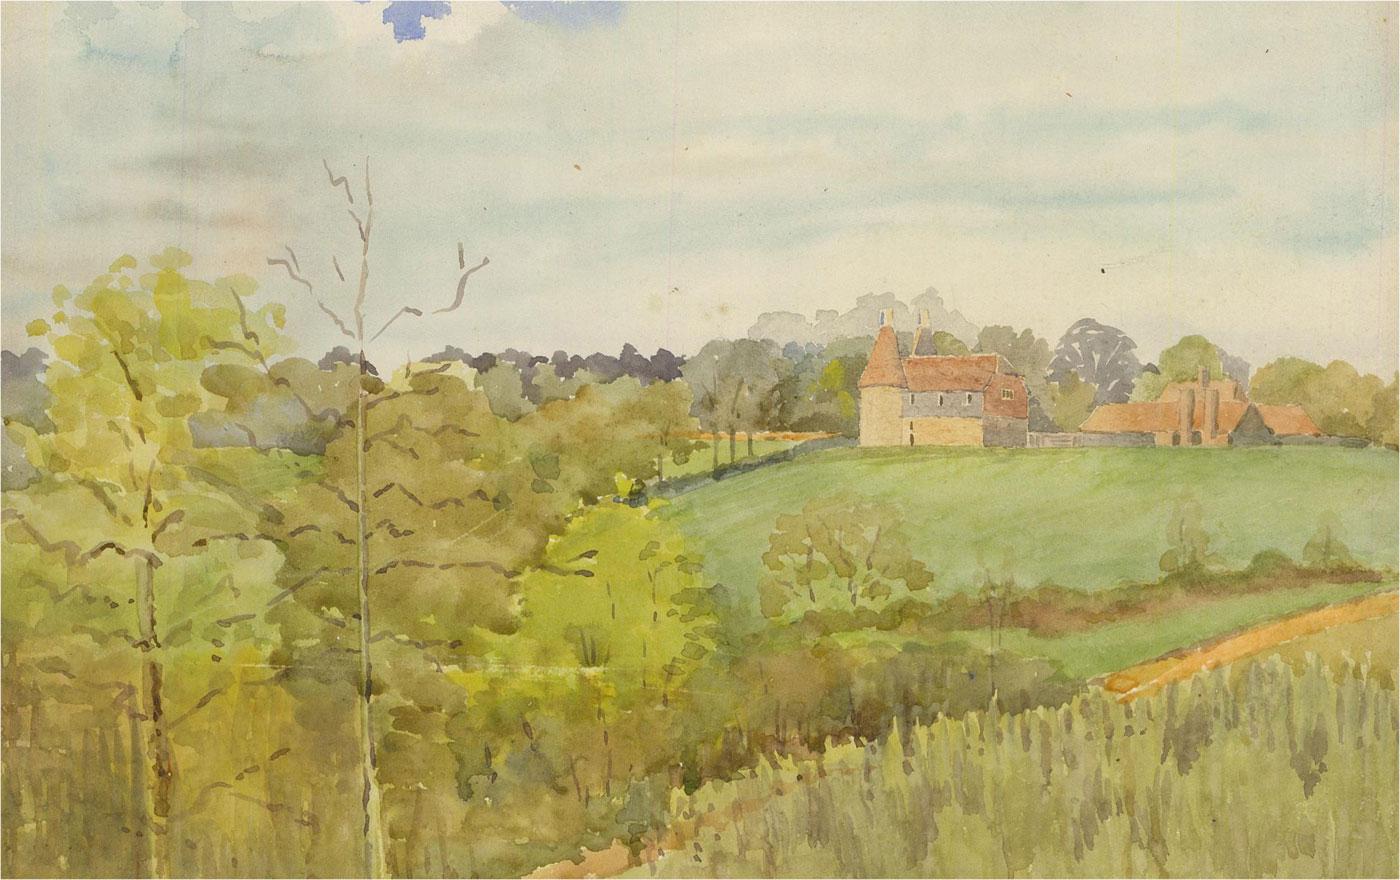 Raymond Turner Barker (1872-1945) - Early 20th Century Watercolour, Rural Farm